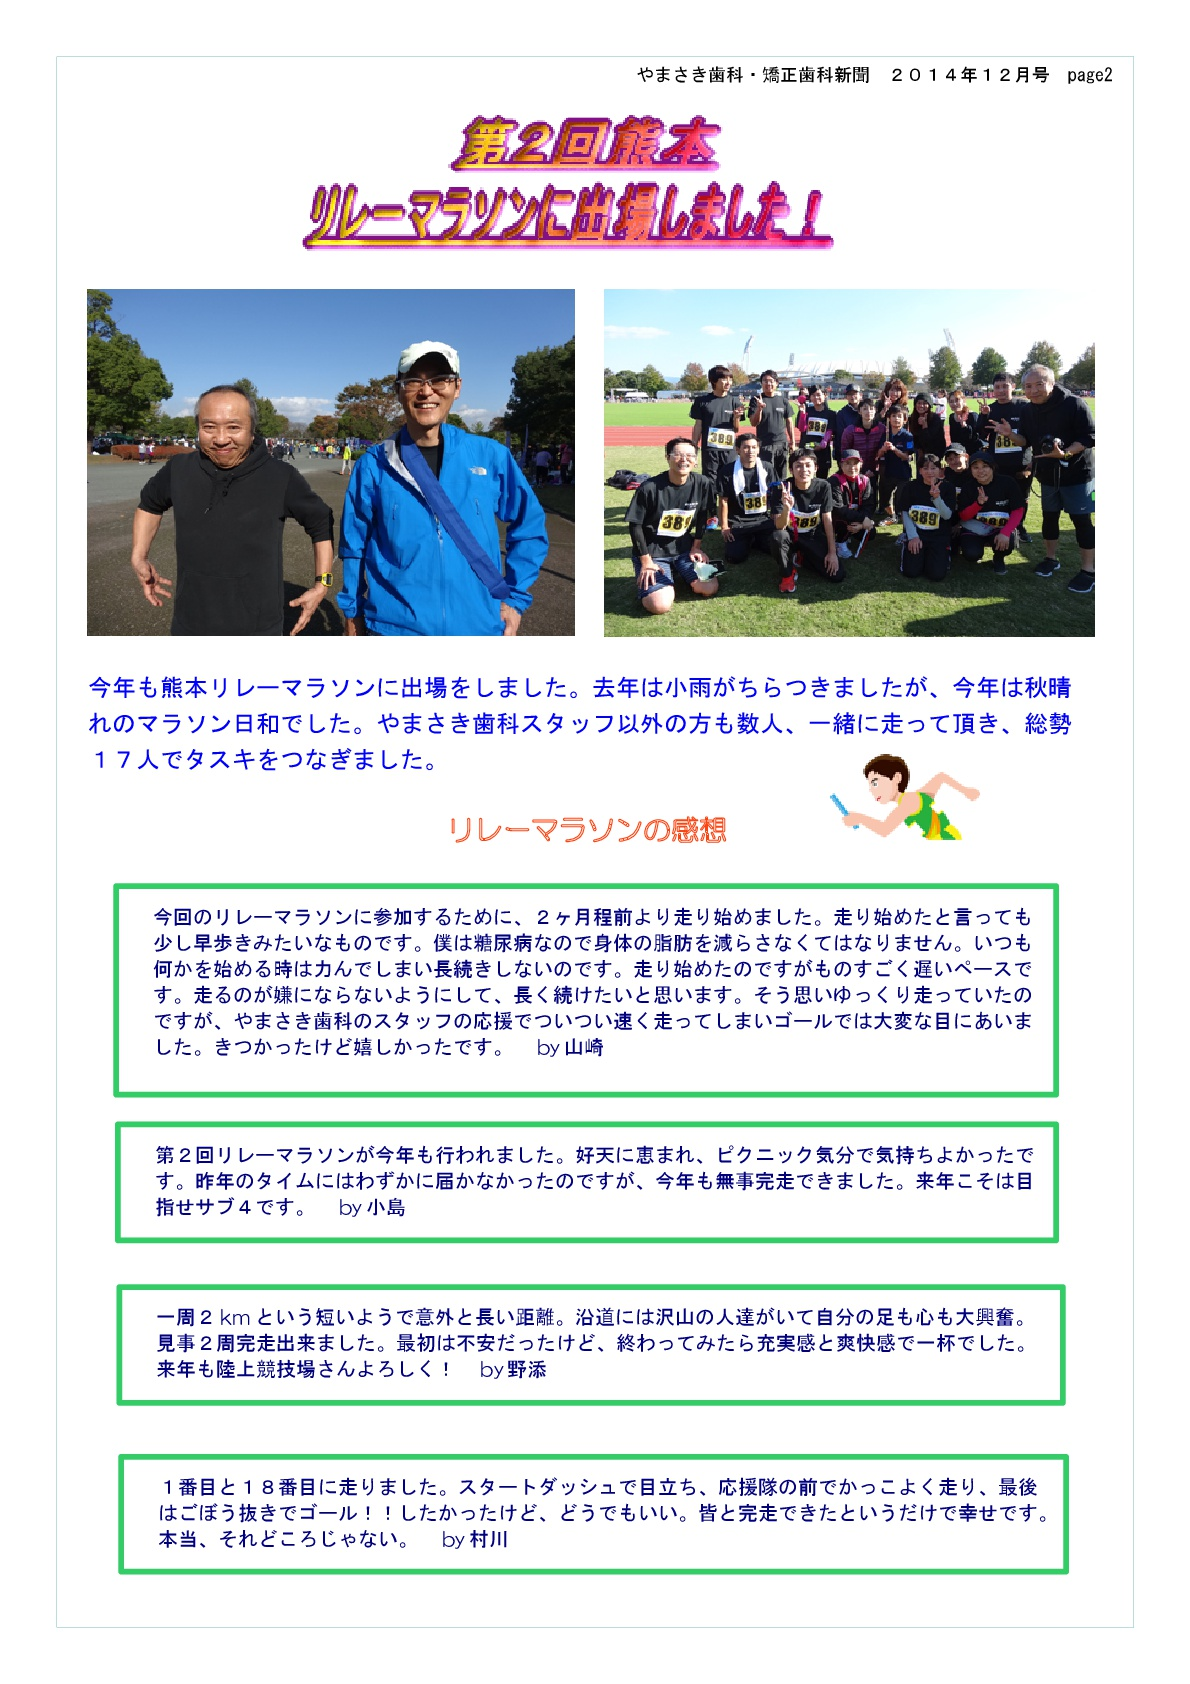 sinbun14-12-2-001